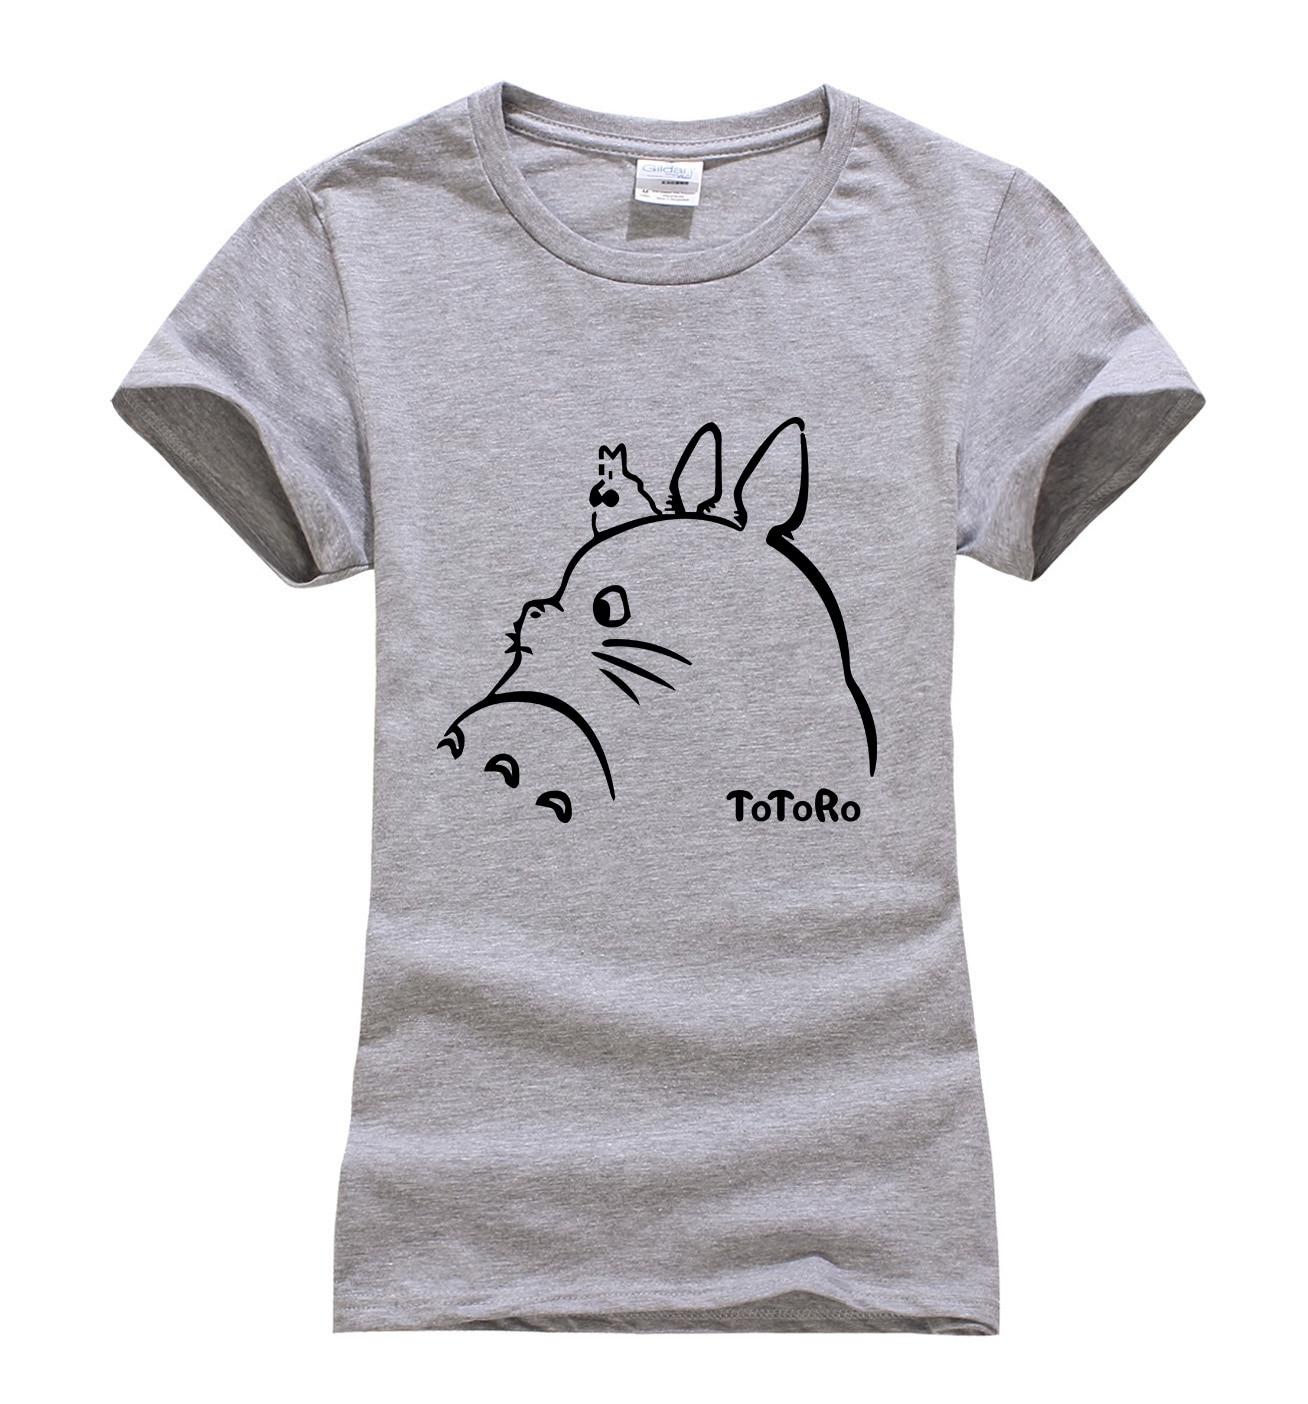 Totoro Shirt Women | Best Anime Shop Online ️